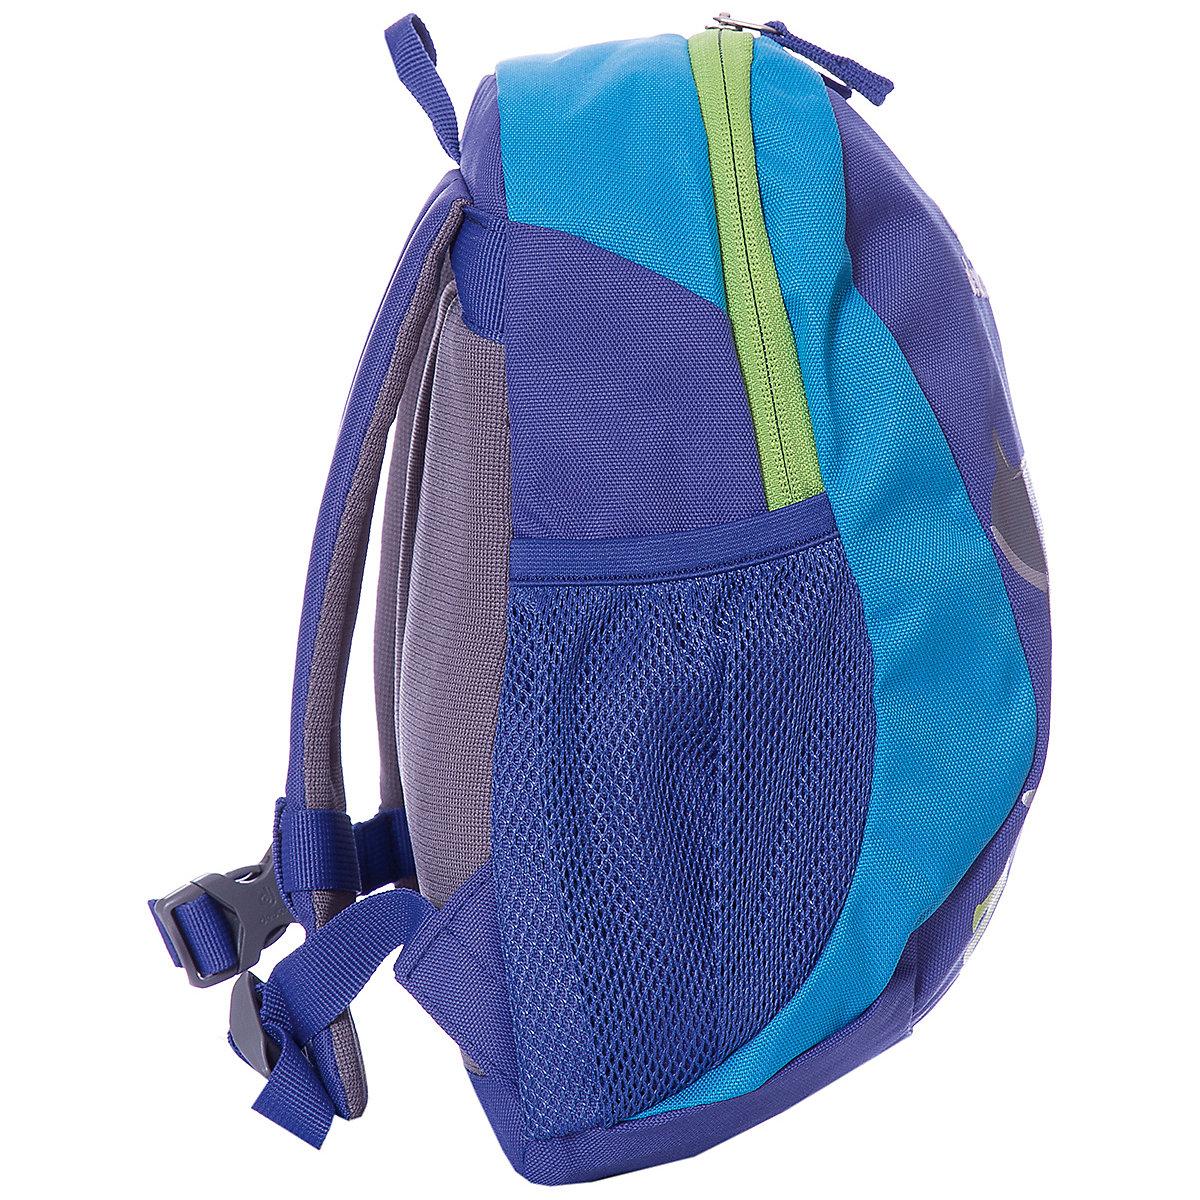 Deuter, Kinderrucksack PICO indigo turquoise, blau